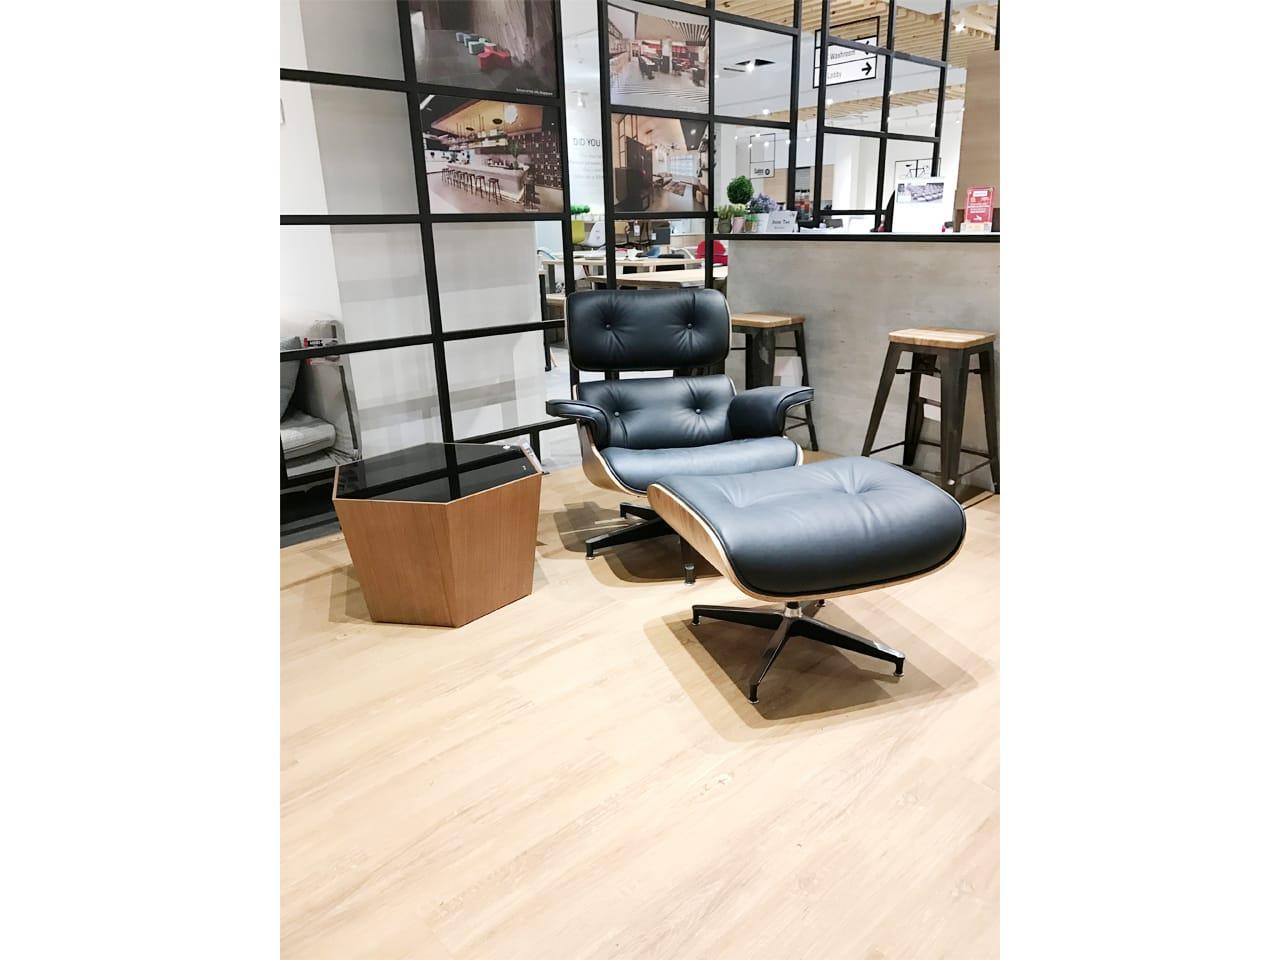 Eames lounge set replica comfort design the chair for Design stuhl replik